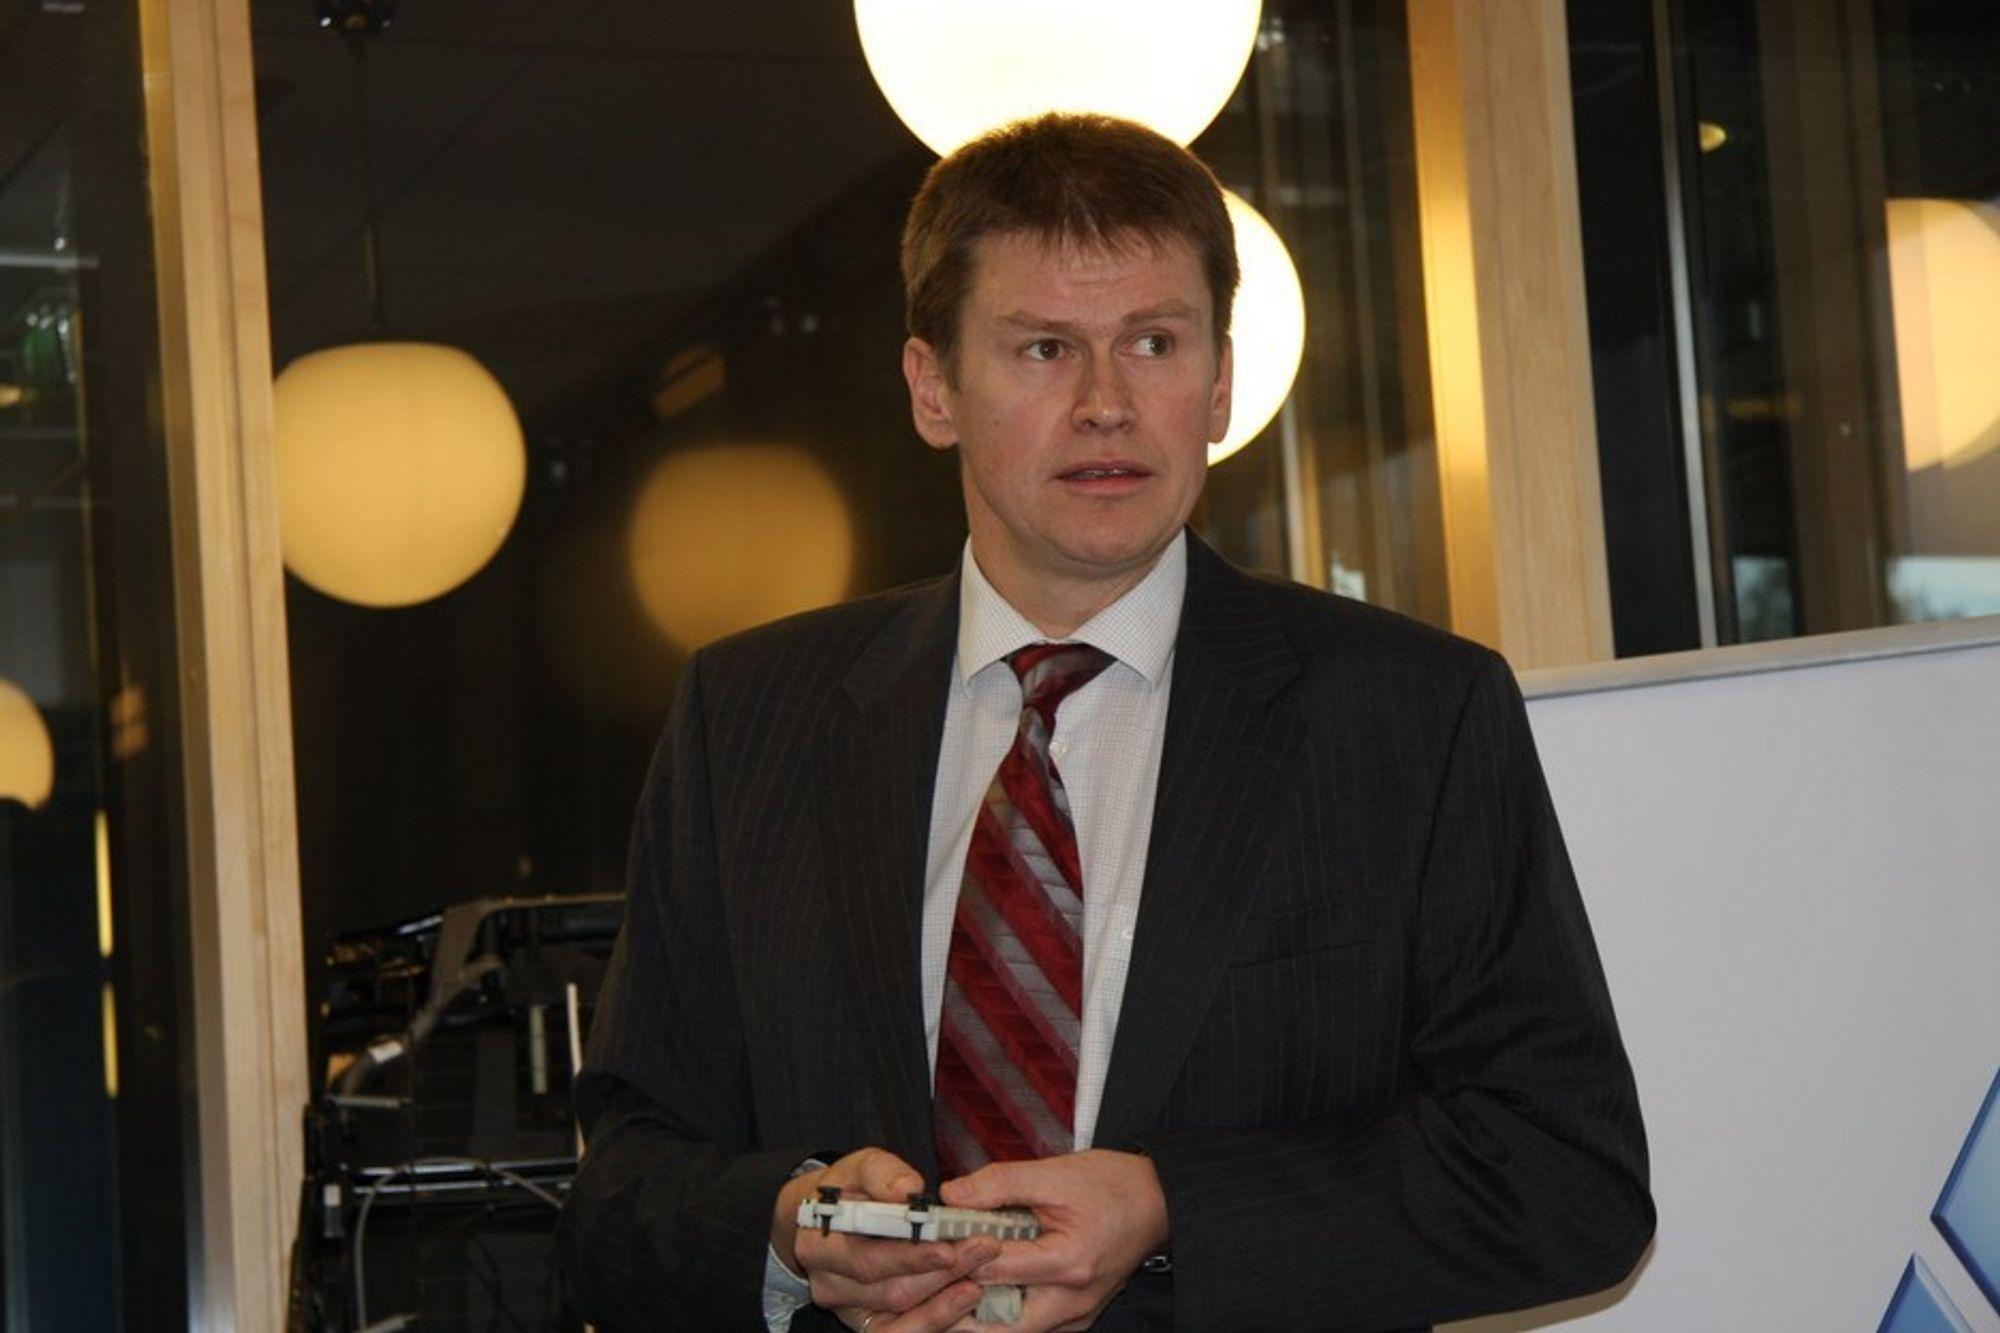 Konsernsjef Hans Peter Havdal i Kongsberg Automotive kan glede seg over ny kontrakt med Chrysler.